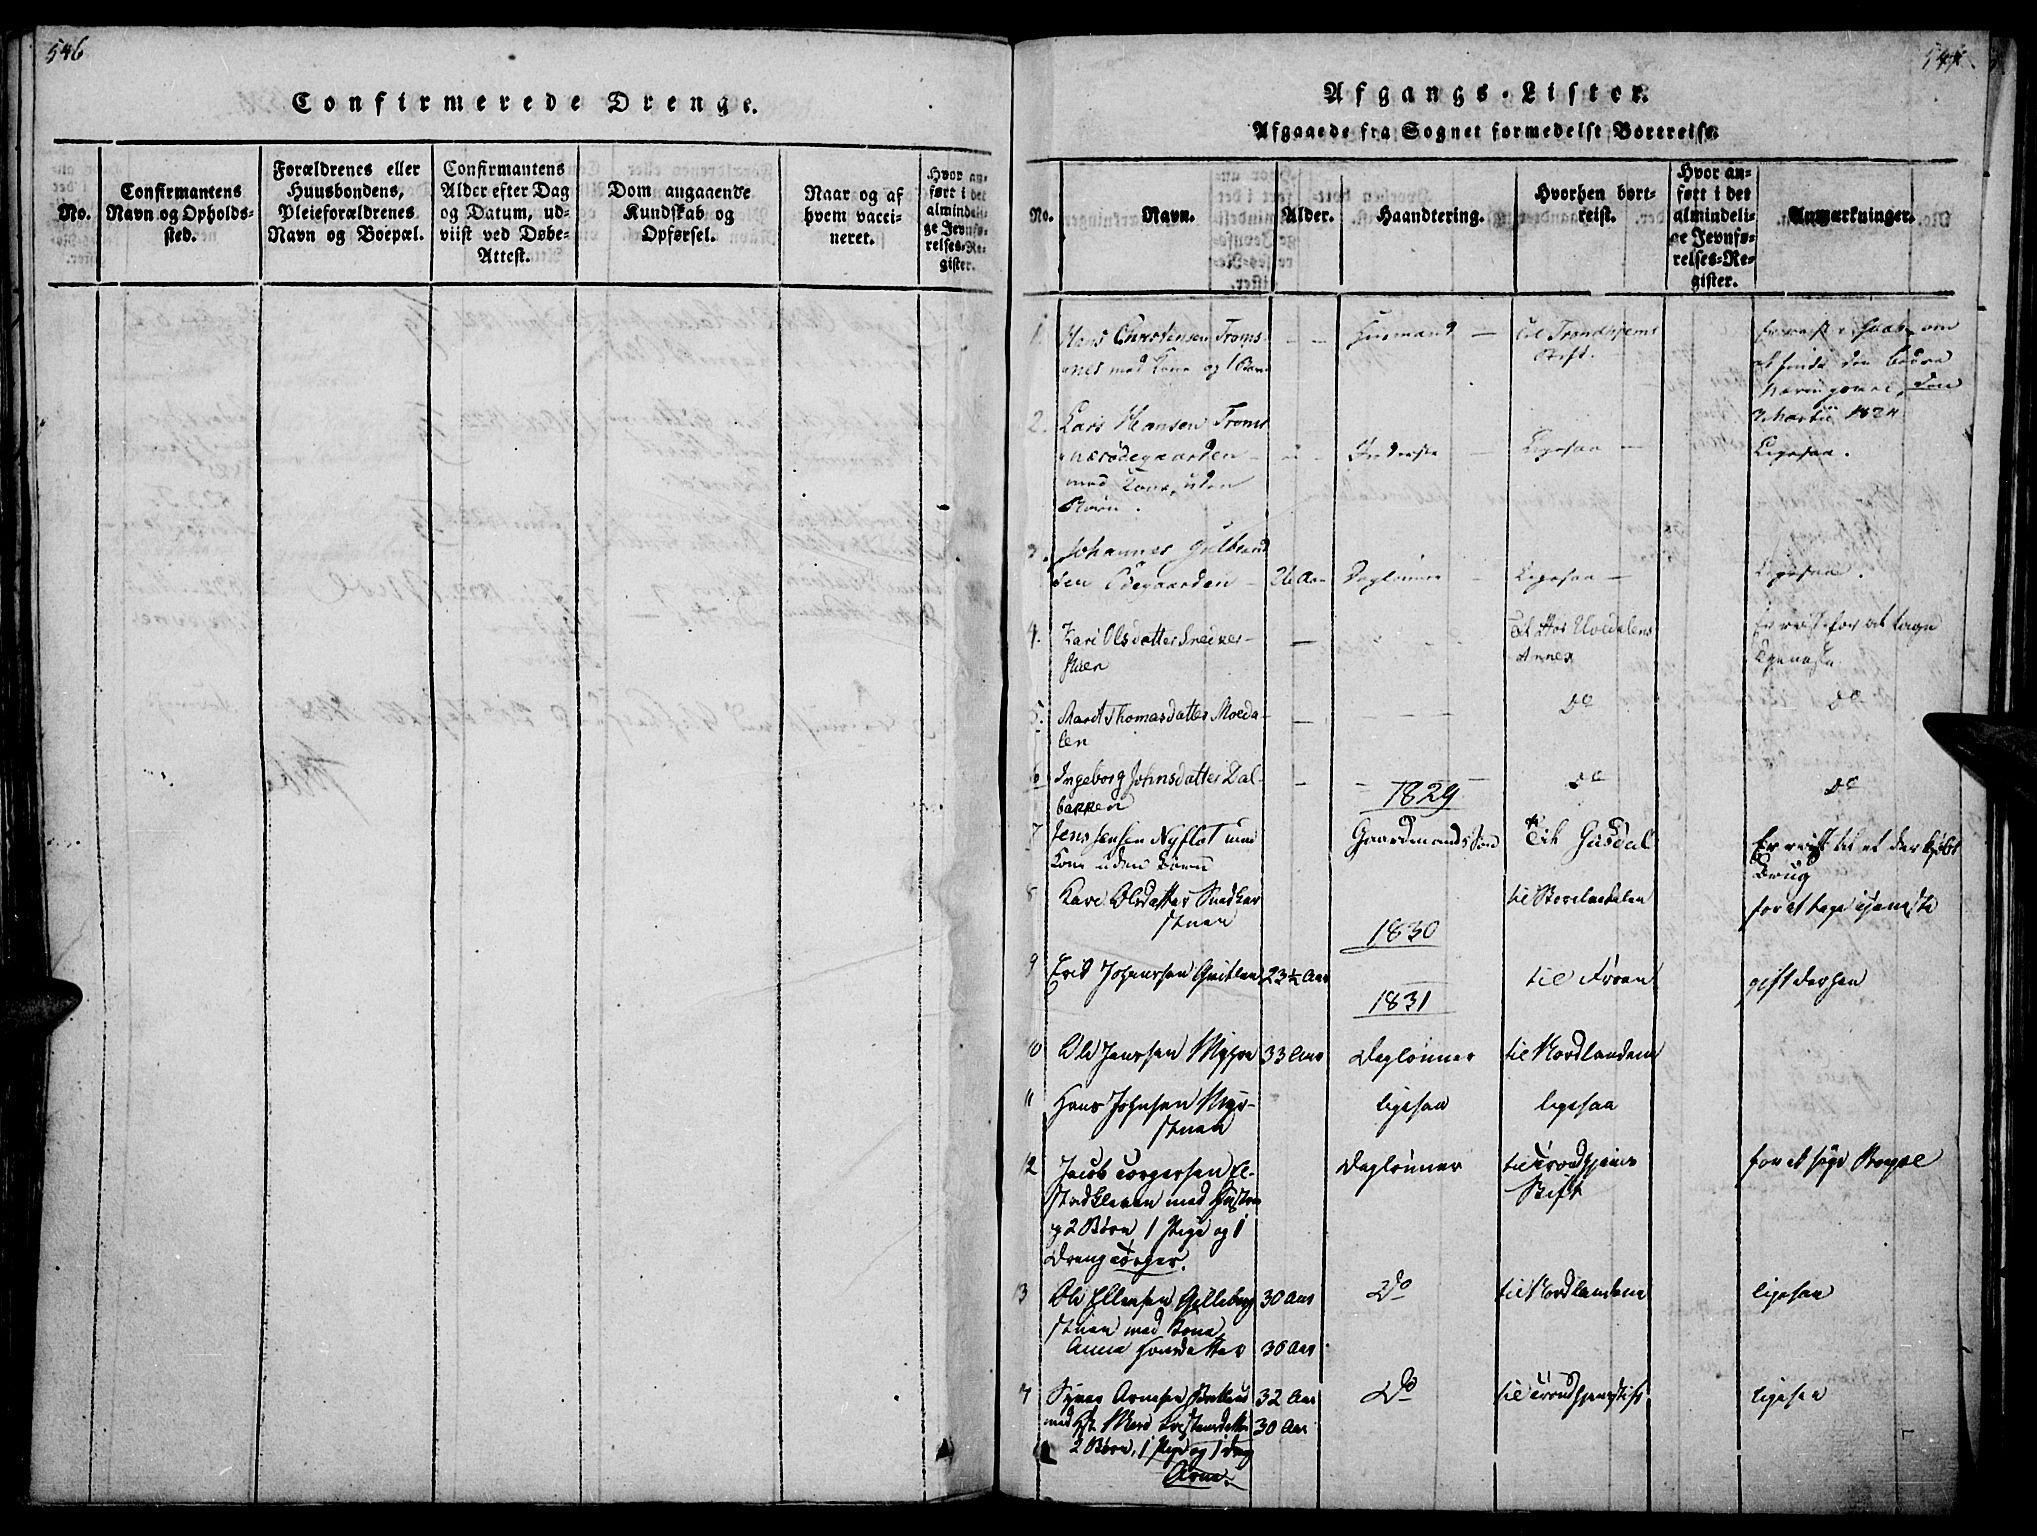 SAH, Ringebu prestekontor, Ministerialbok nr. 4, 1821-1839, s. 546-547